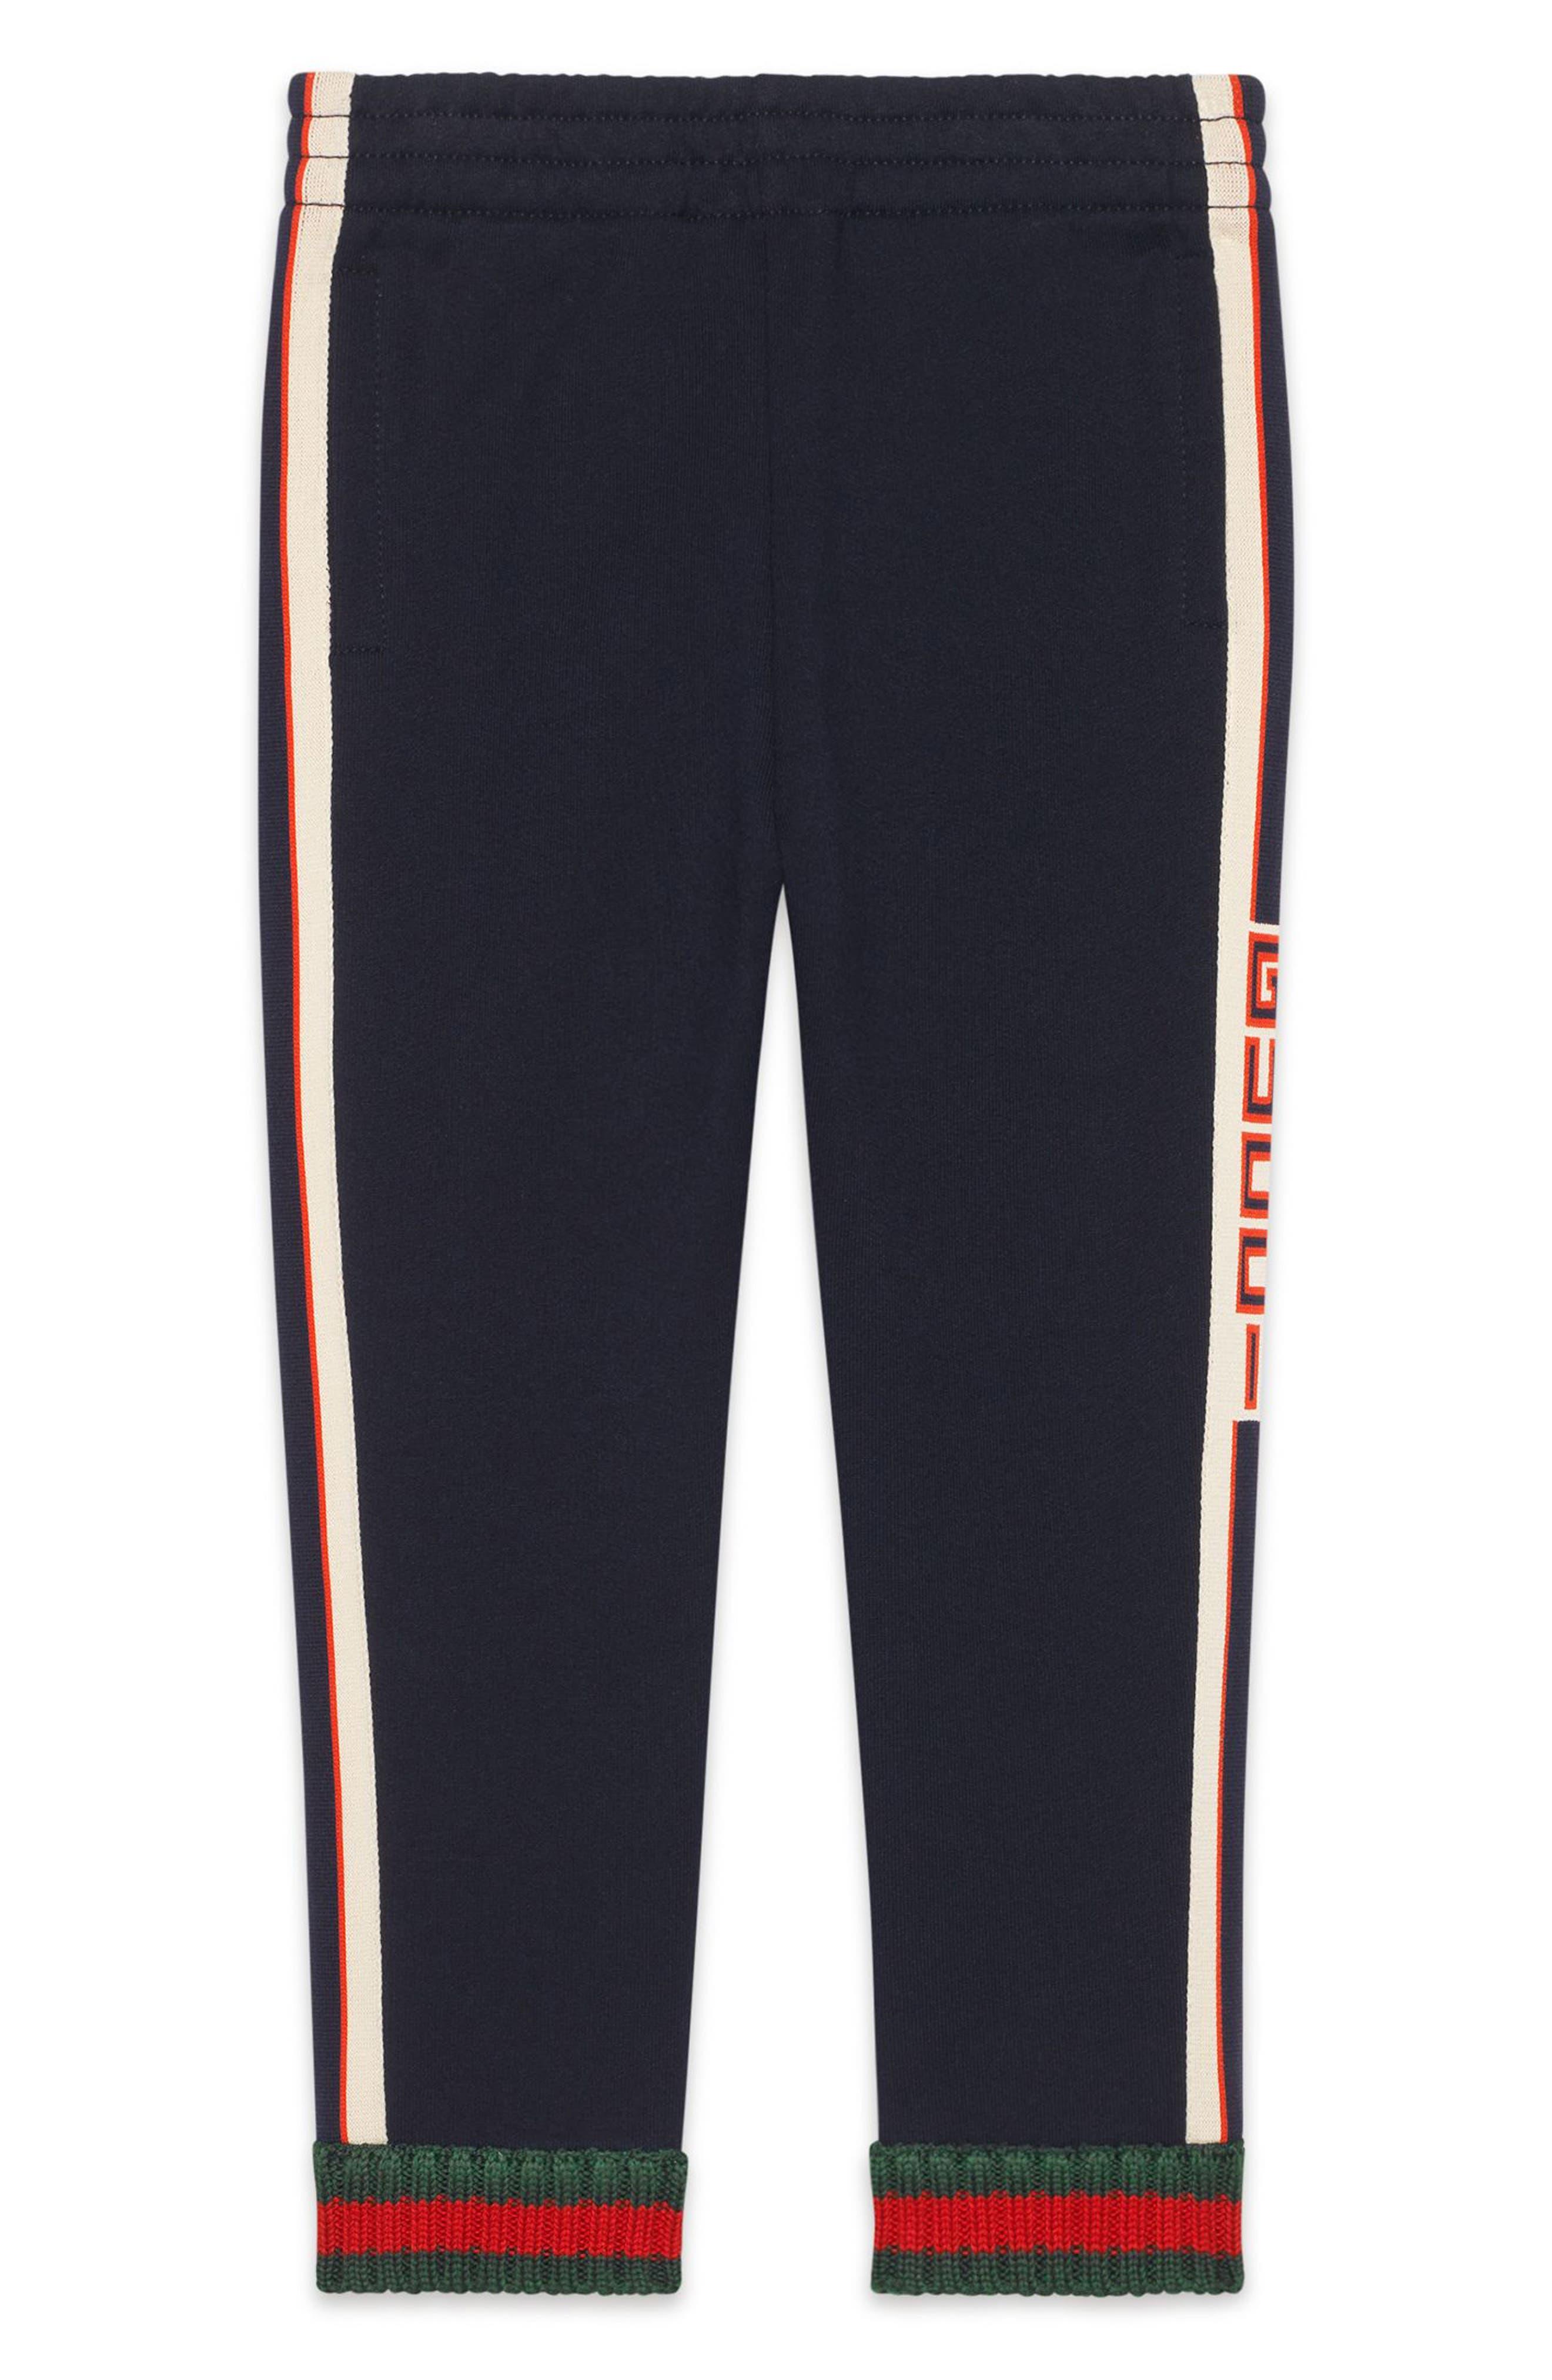 Alternate Image 1 Selected - Gucci Logo Stripe Jogging Pants (Little Boys & Big Boys)